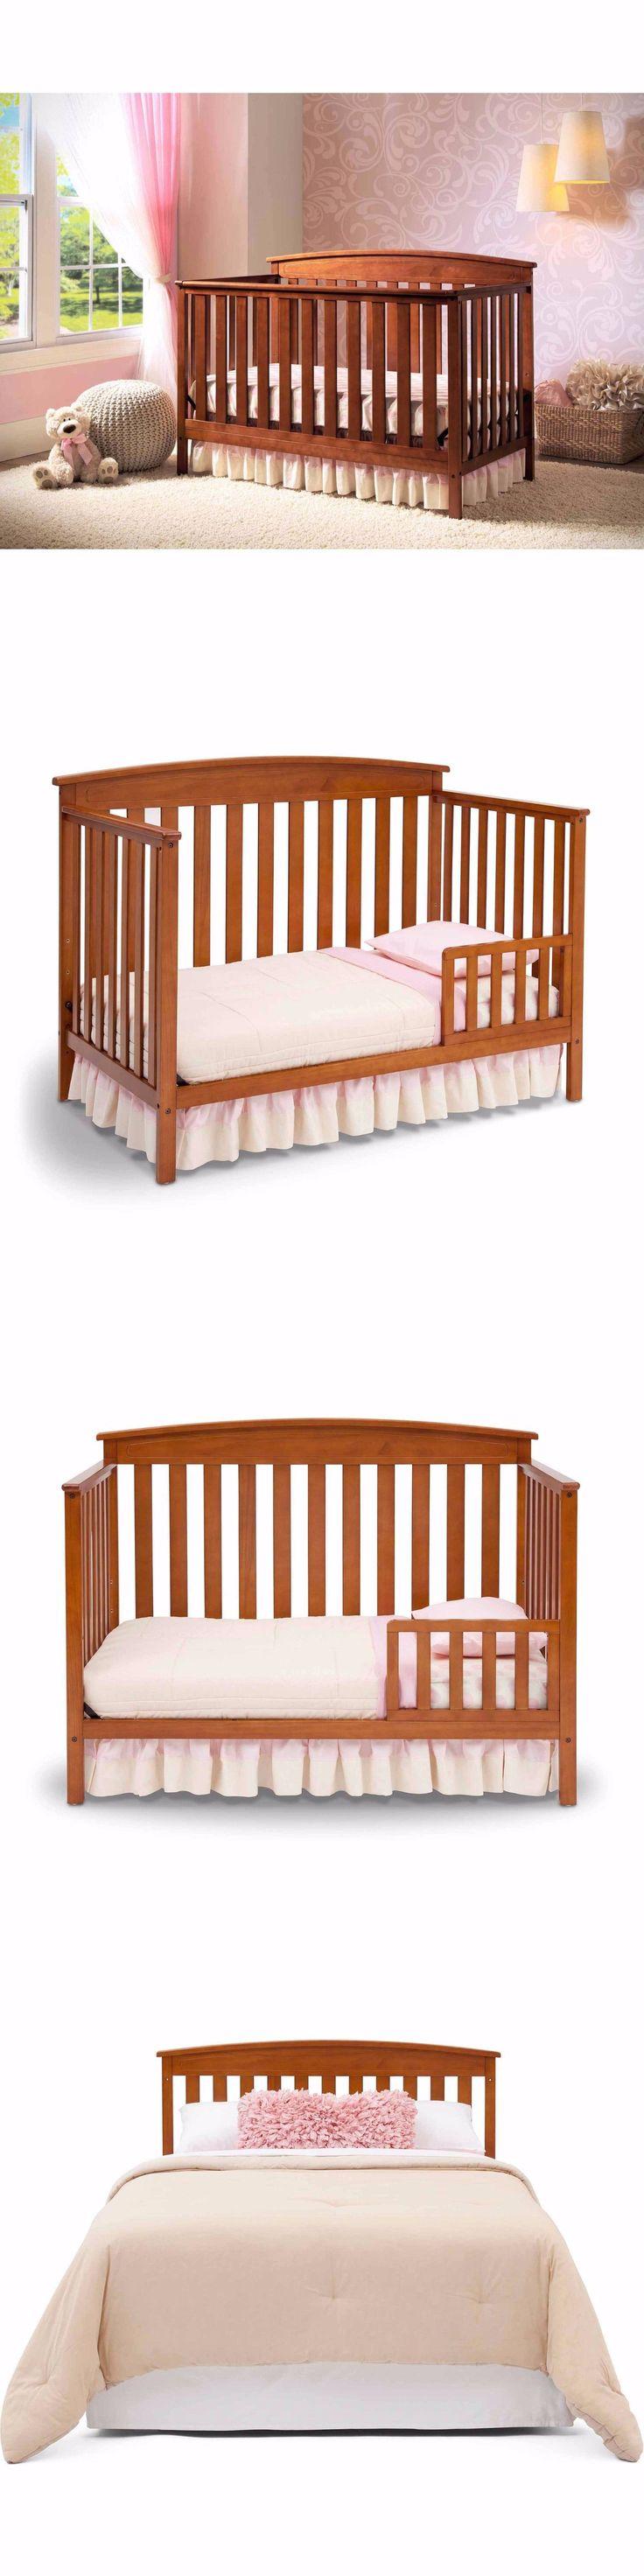 Saplings katie crib for sale - The 25 Best Ideas About Baby Cot Mattress On Pinterest Crib Mattress Cot Mattress And Cot Bed Mattress